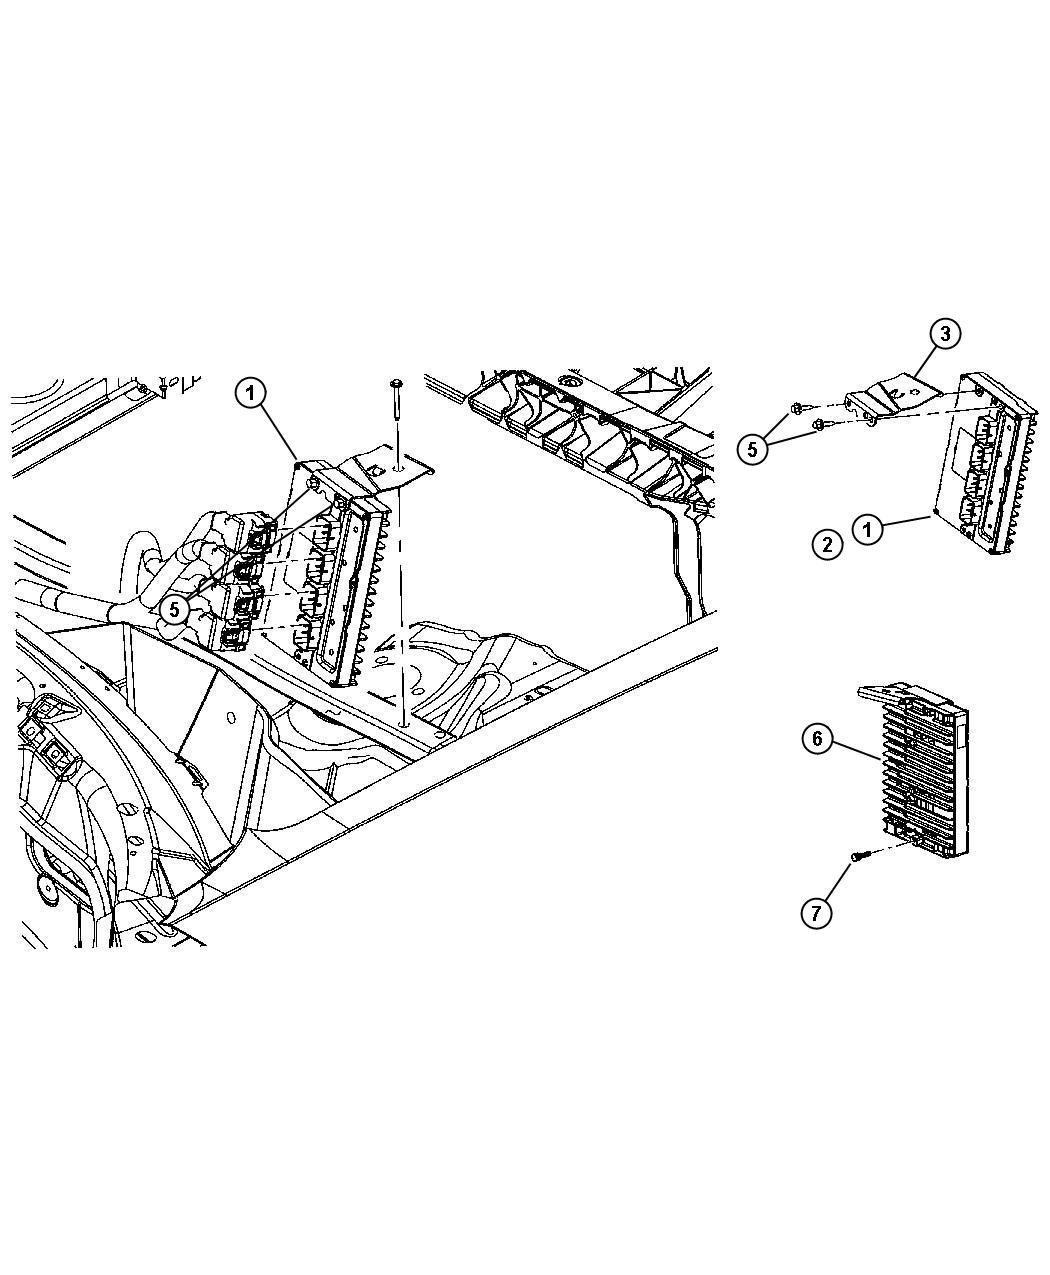 2006 Dodge Charger Module. Powertrain control. New part